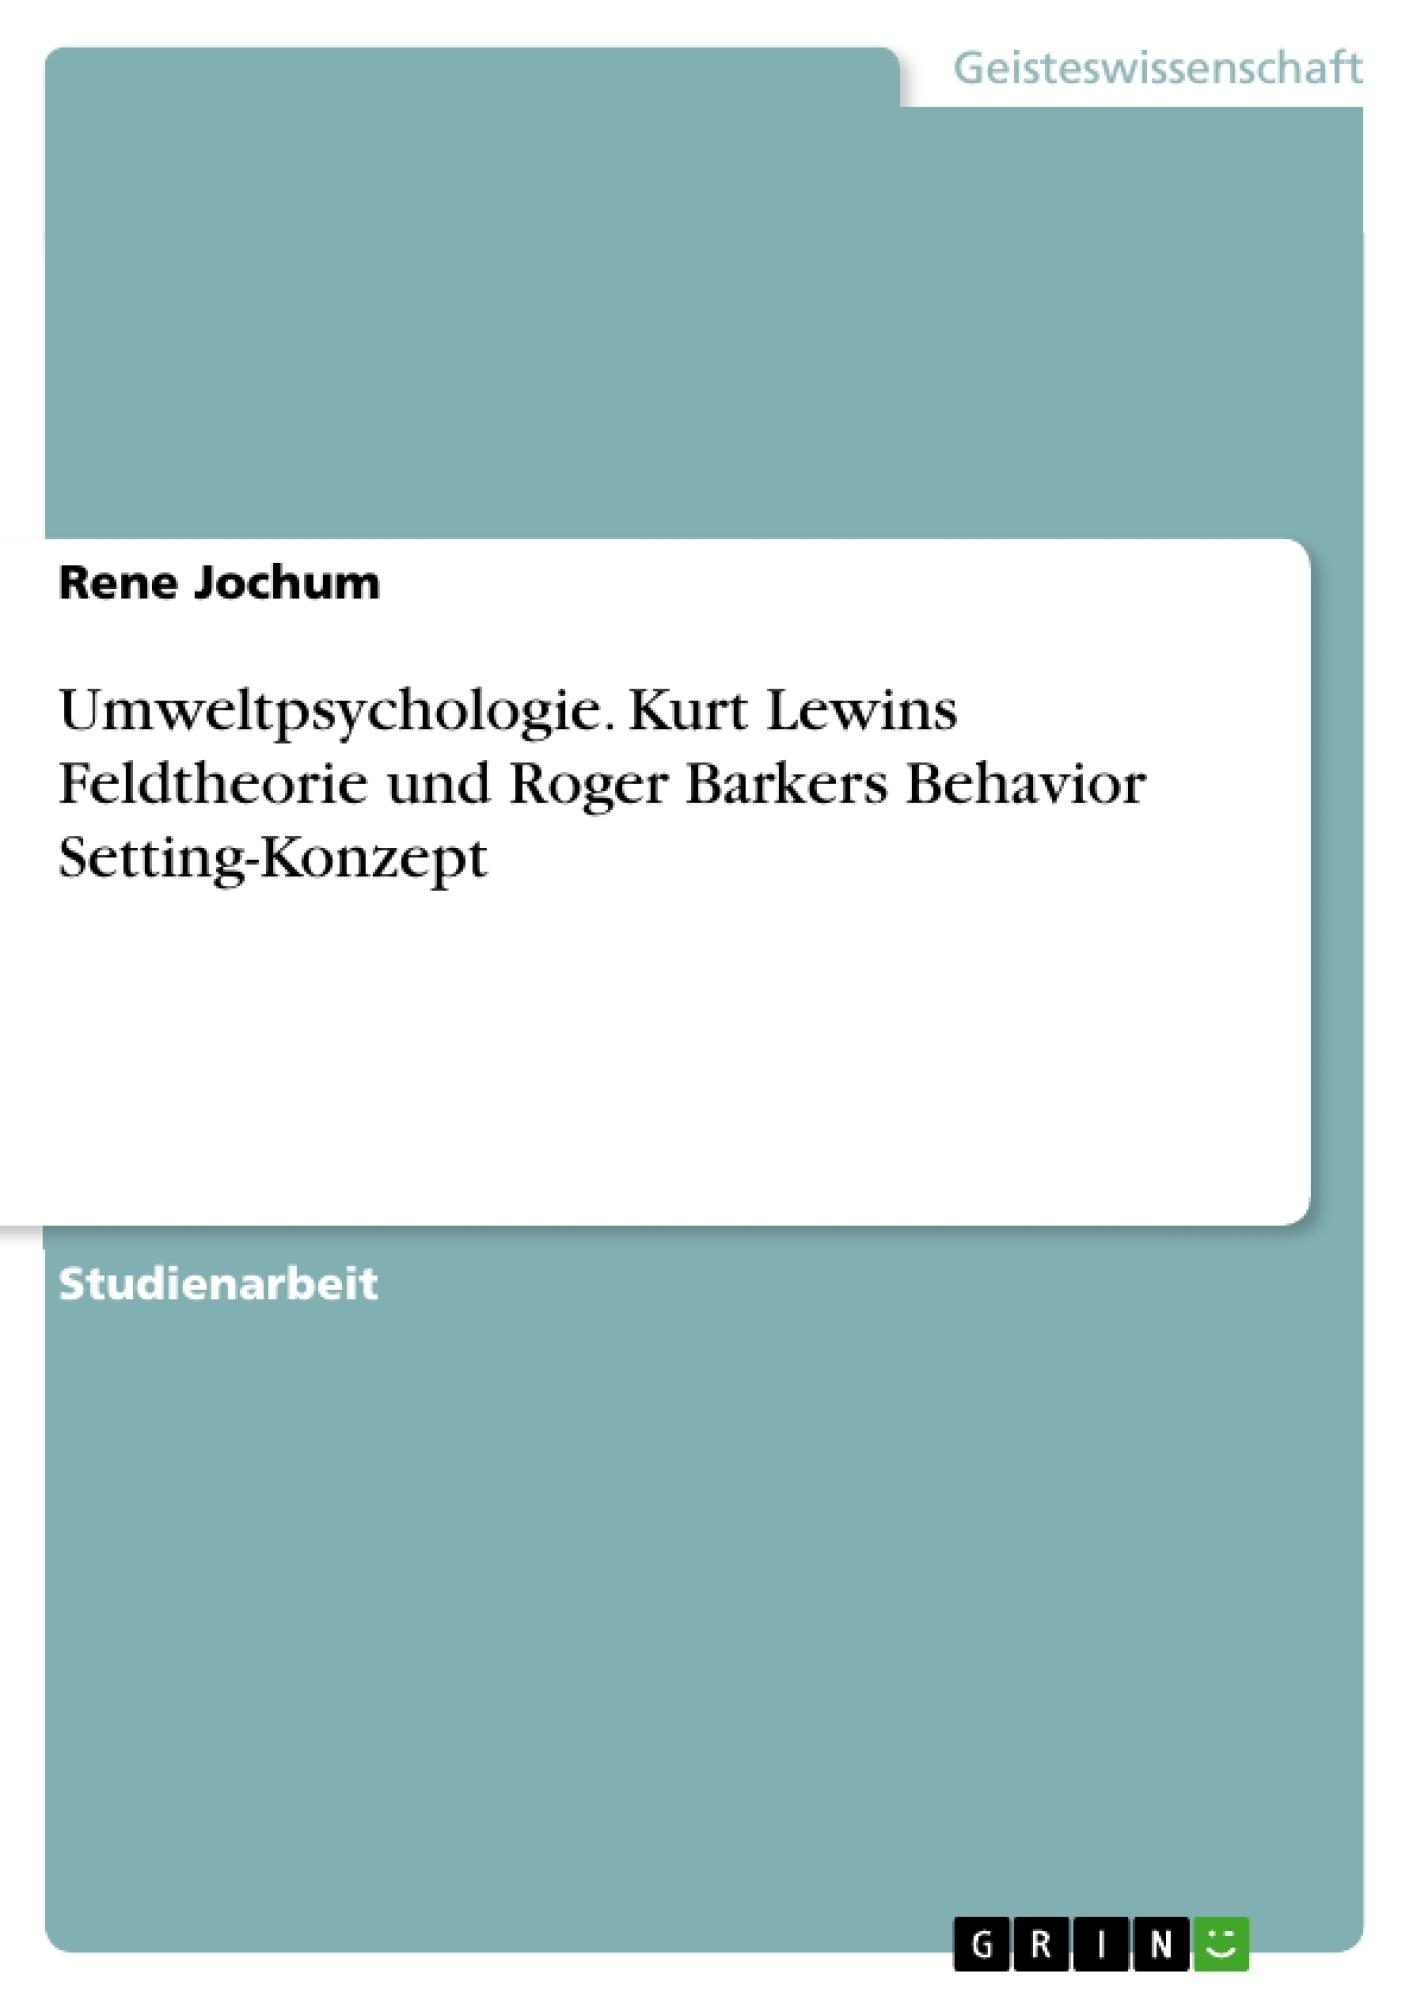 Titel: Umweltpsychologie. Kurt Lewins Feldtheorie und Roger Barkers Behavior Setting-Konzept